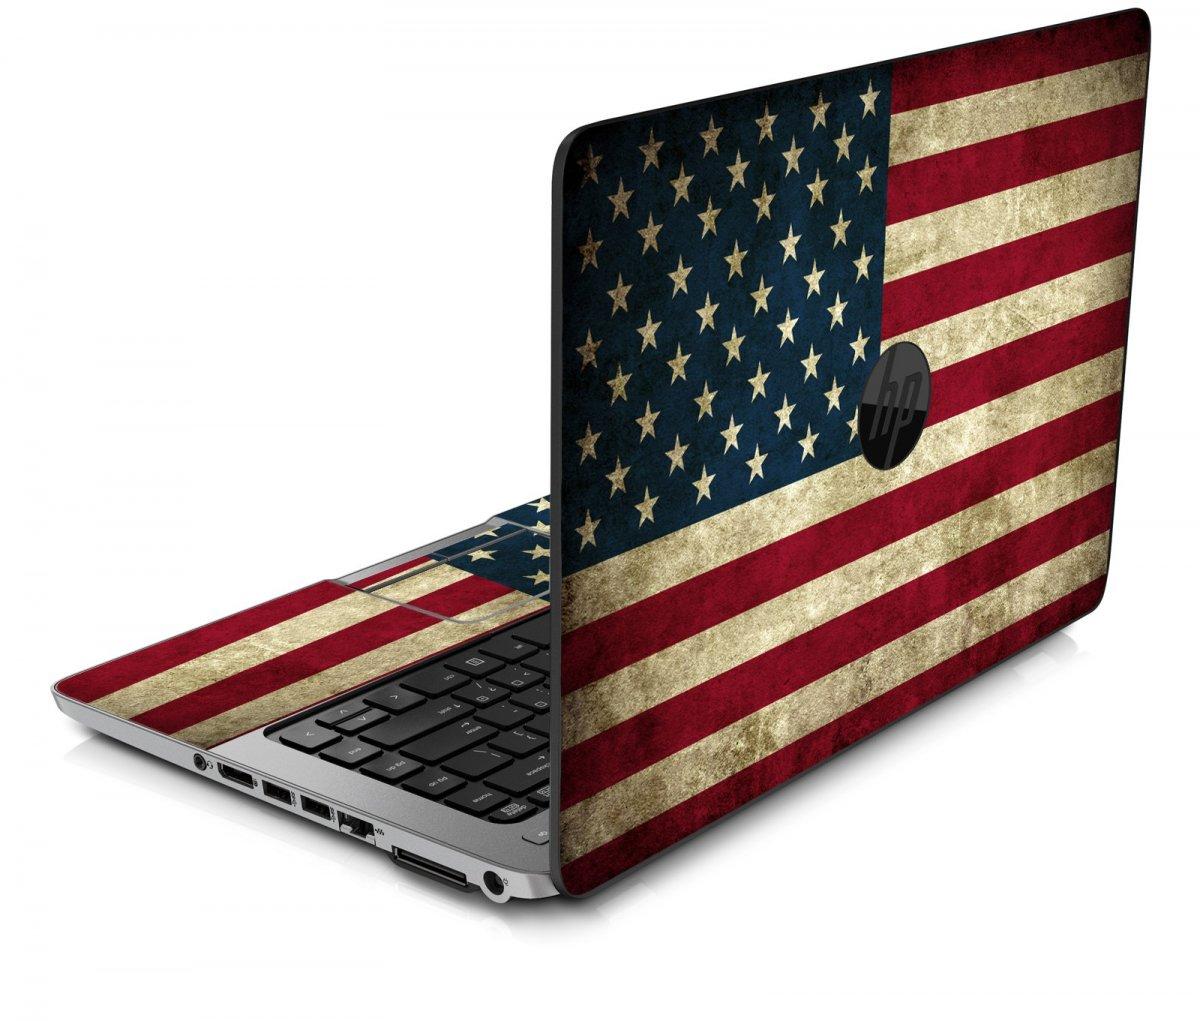 AMERICAN FLAG HP ProBook 850 G1 Skin